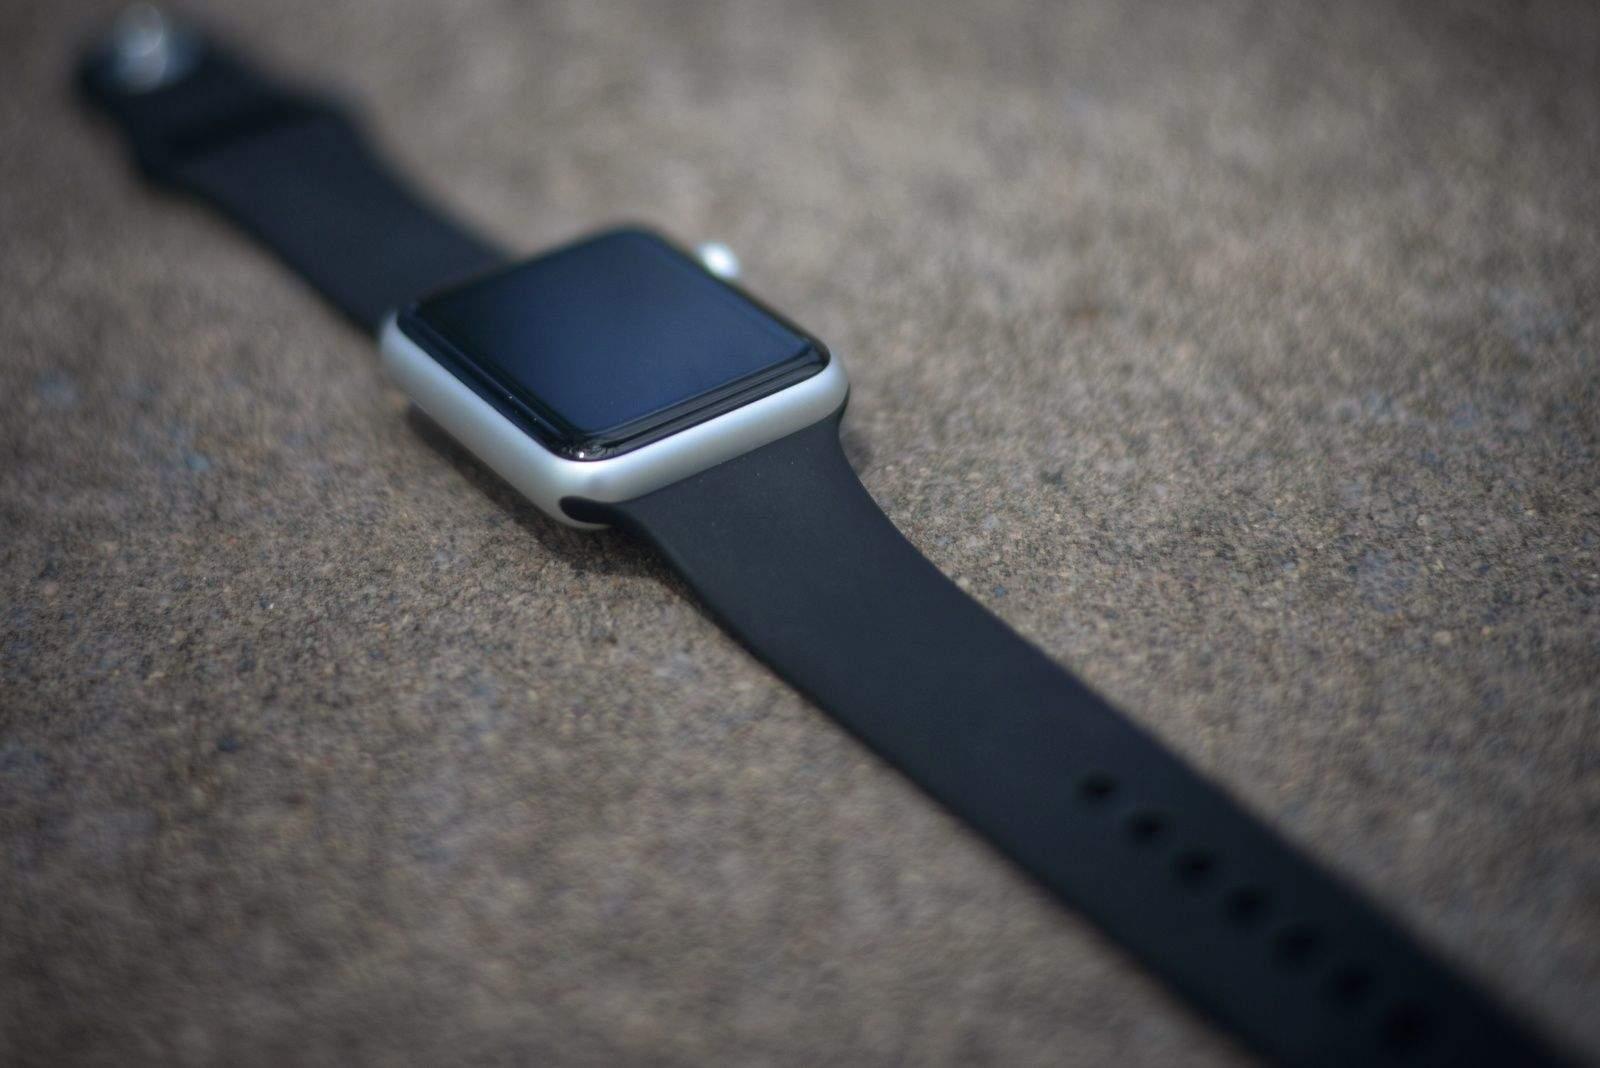 Apple Watch sport with black fluoroelastomer band.